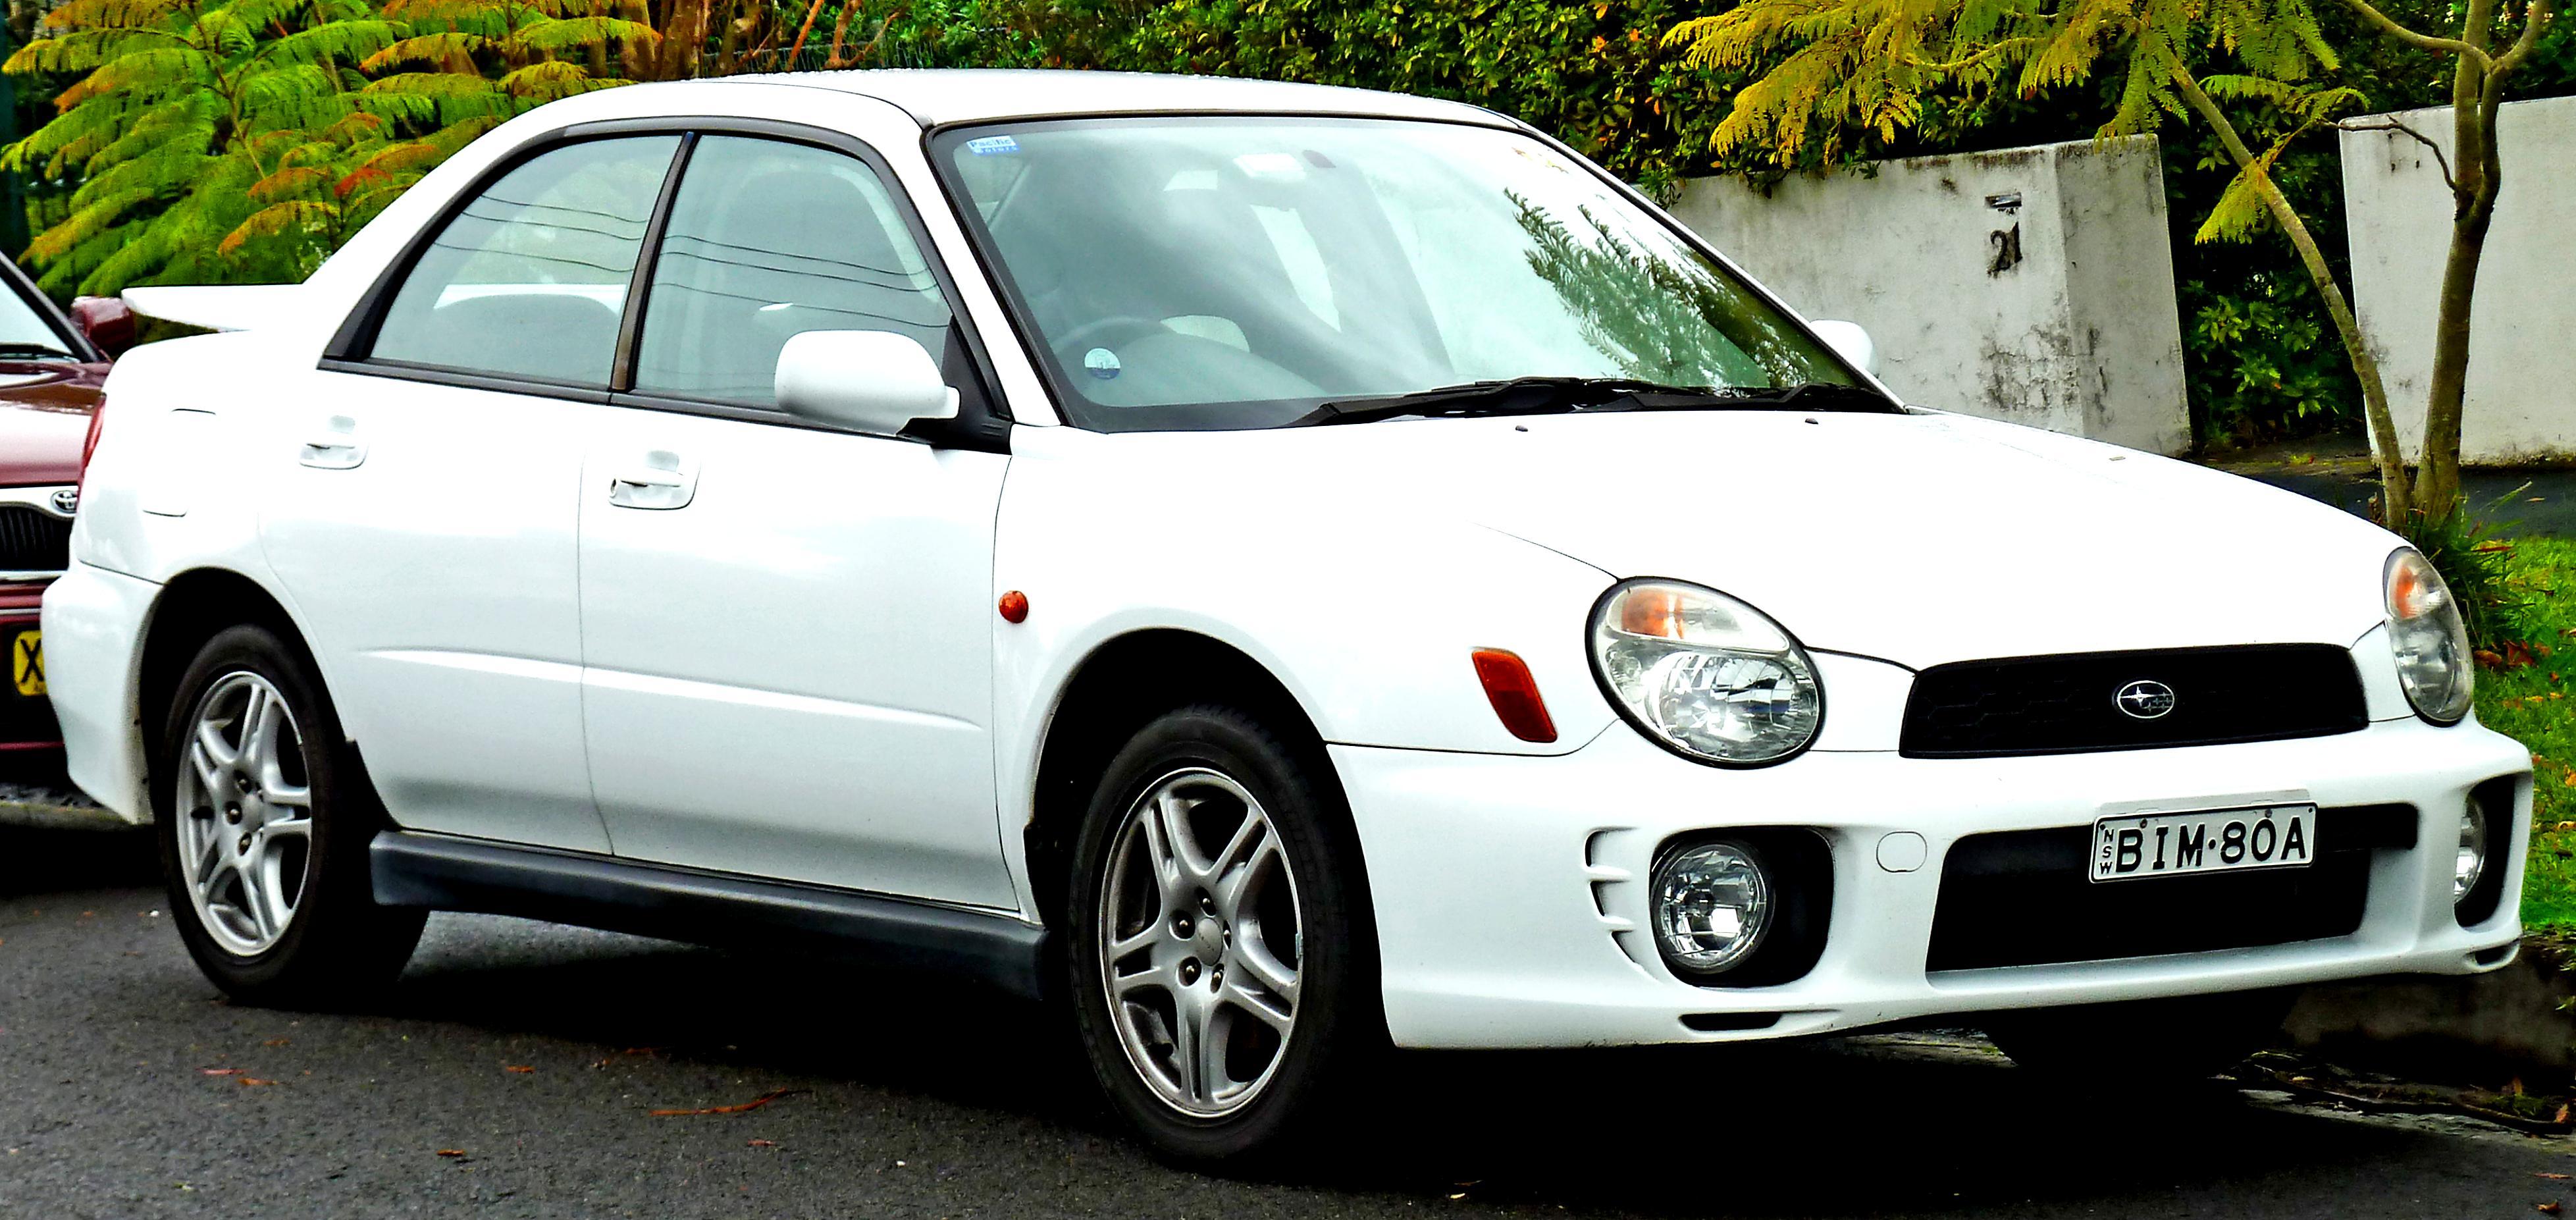 Subaru Impreza Wrx Sti 2001 On Motoimg Com